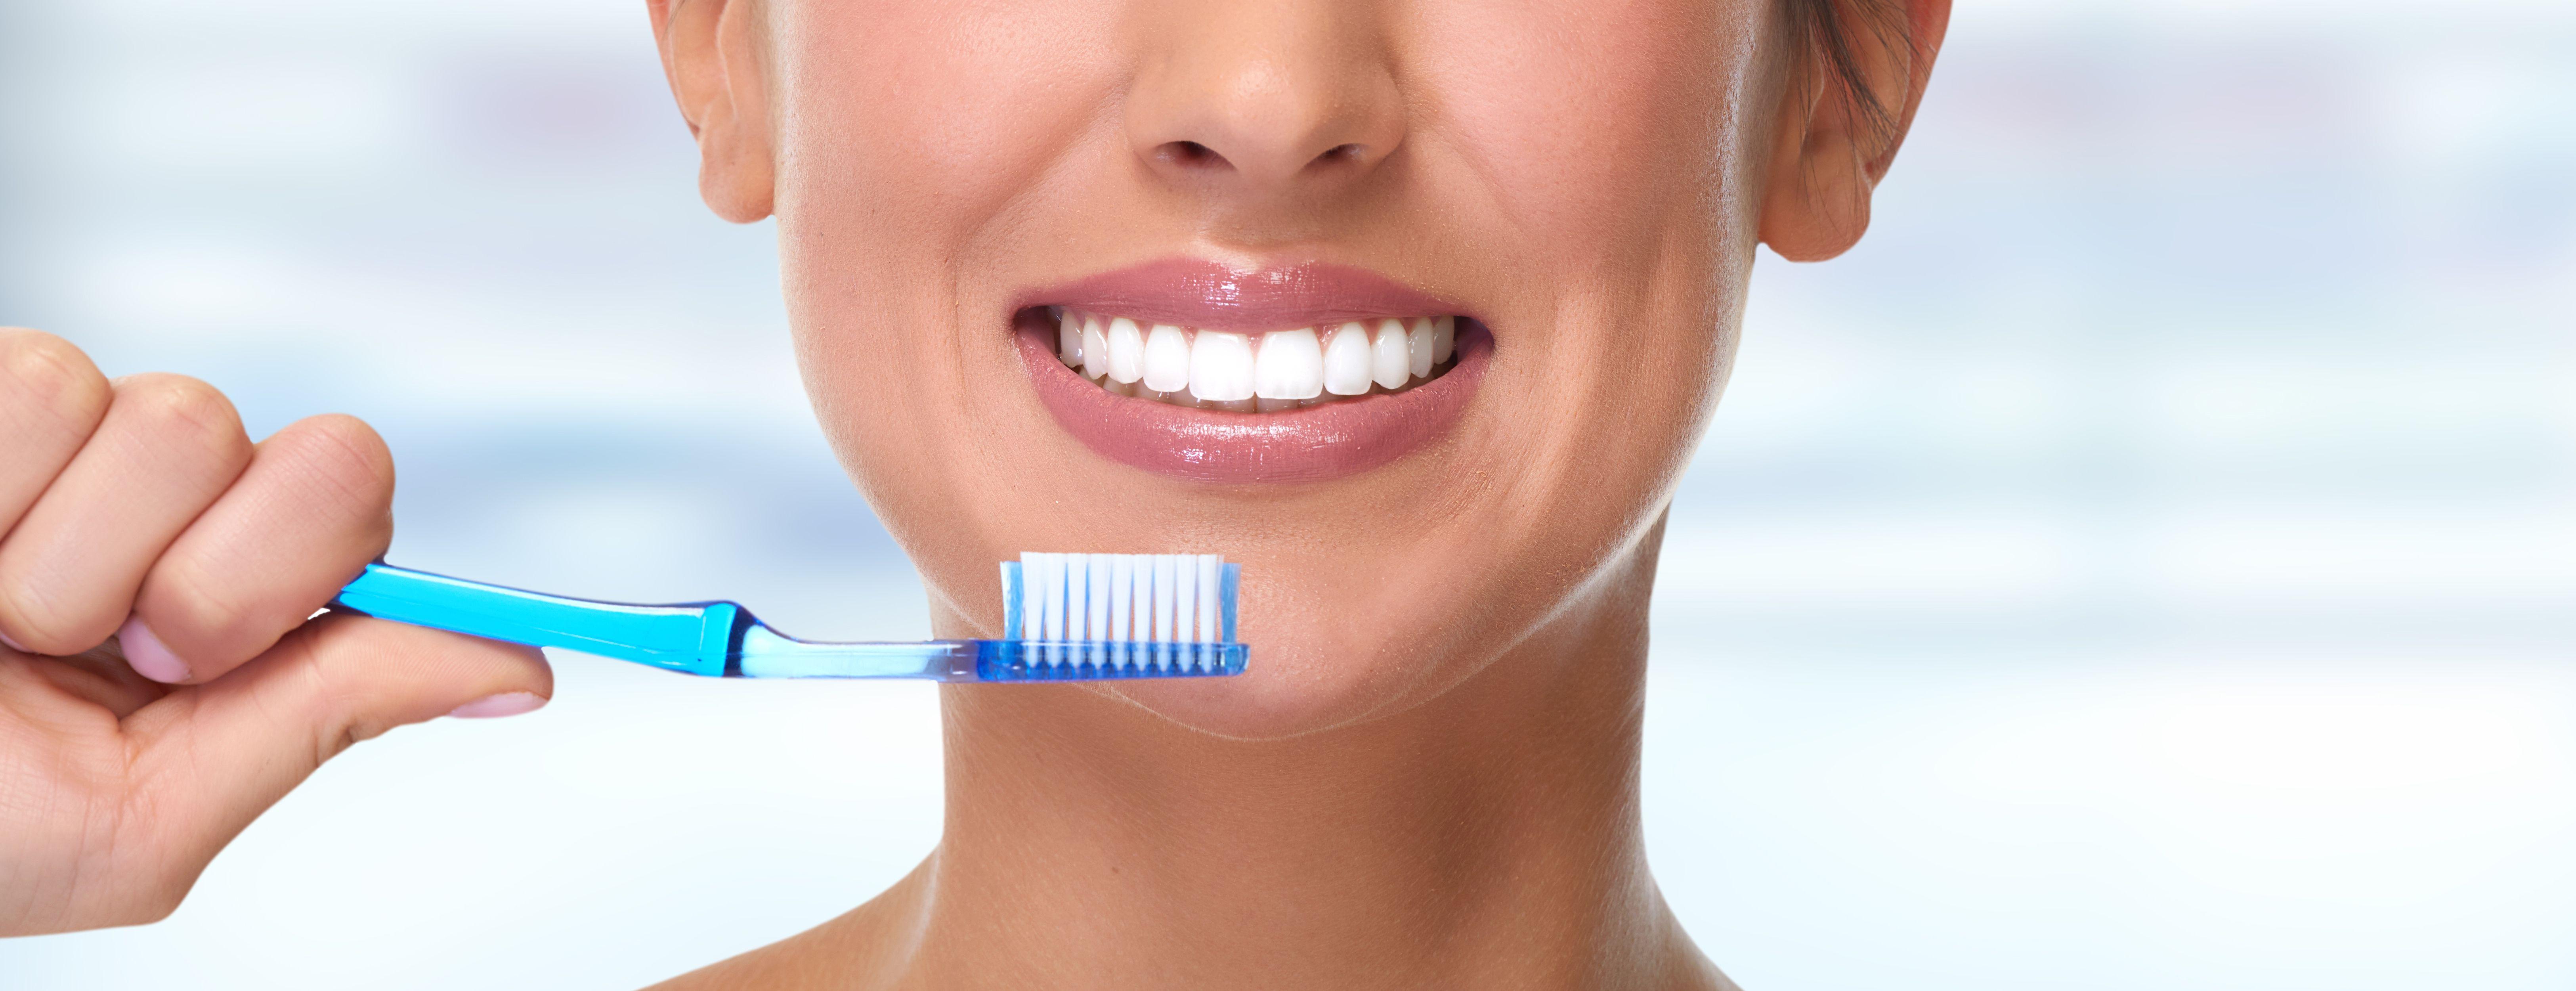 Higiene dental: Tratamientos de Centro Dental Ortodoncia Dra. López